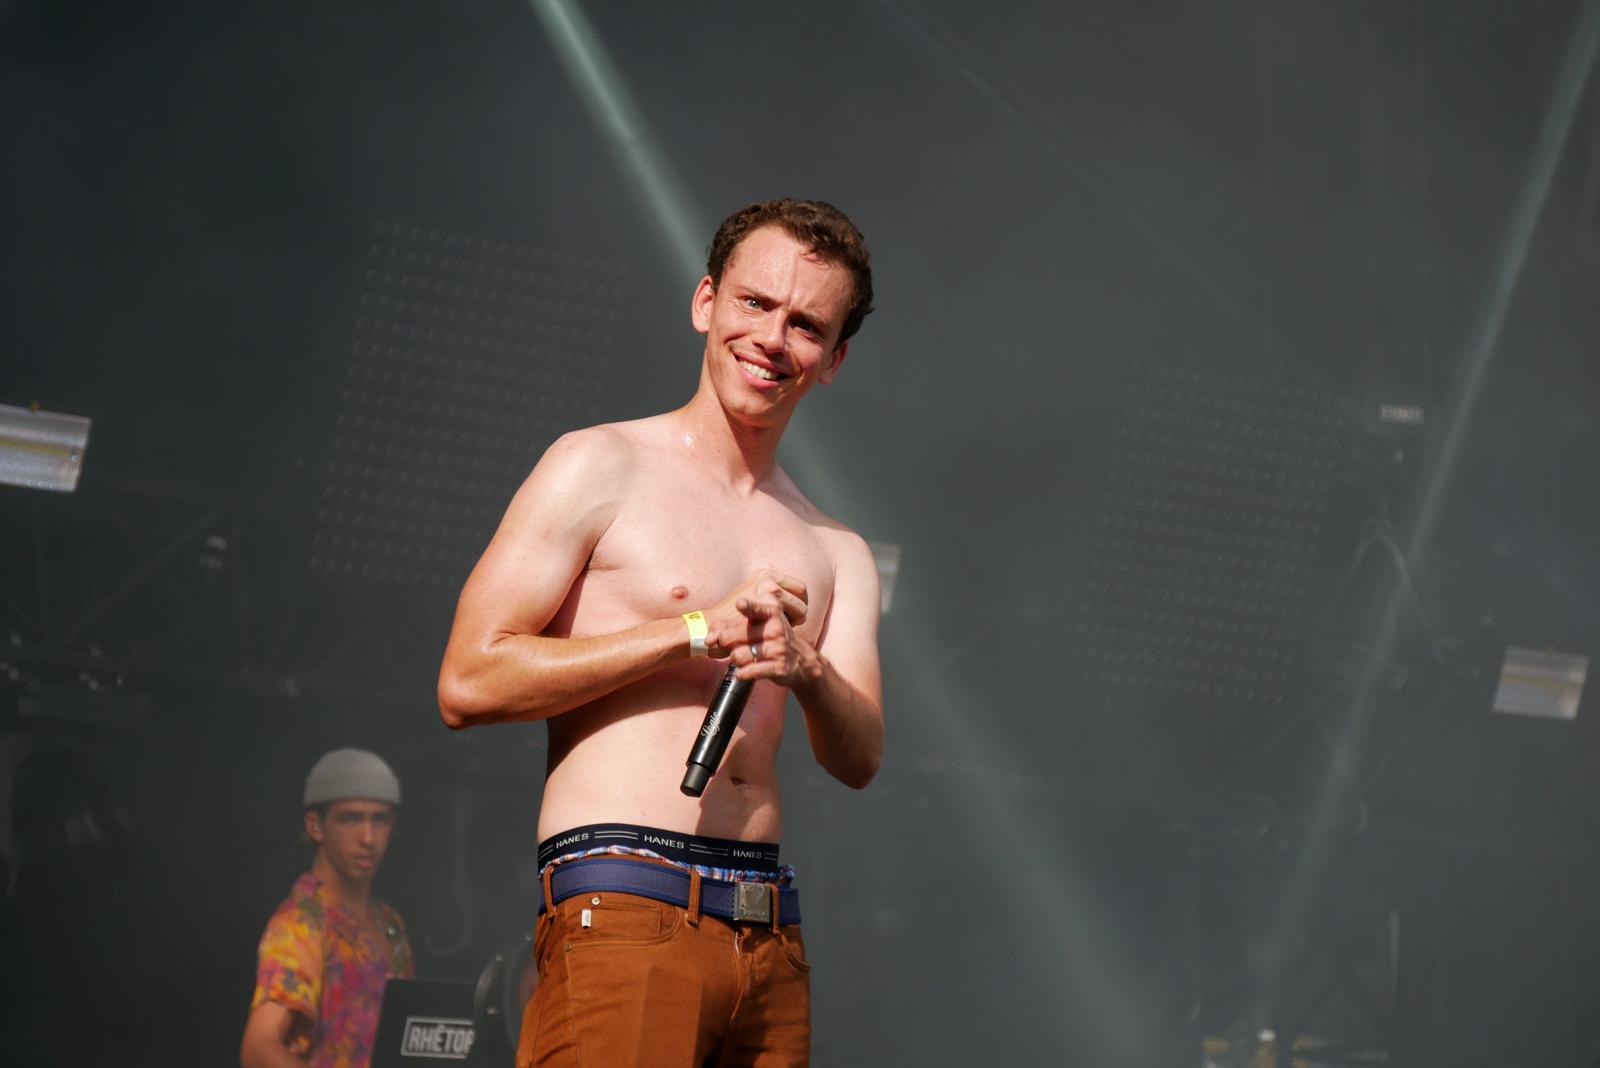 Logic smile live concert Rock en Seine 2016 festival logic301 Bobby Tarantino tour stage photo usofparis blog